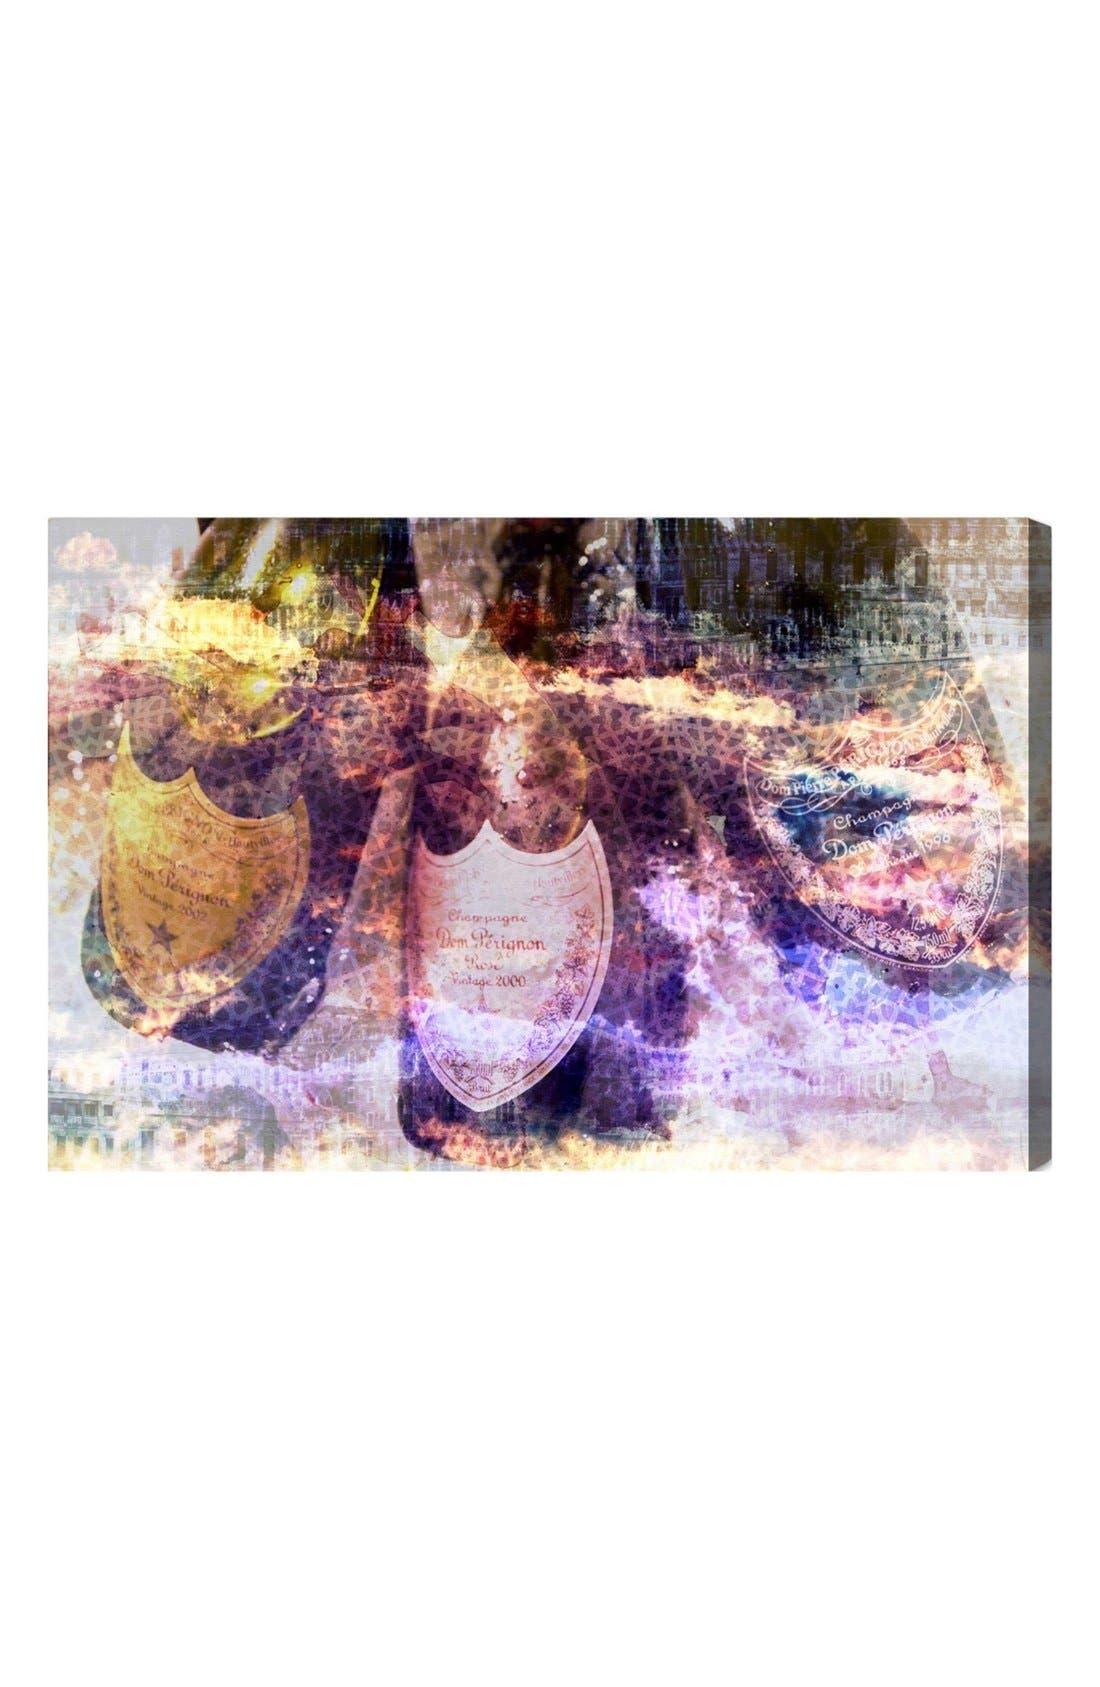 'Champagne Bath' Canvas Wall Art,                             Main thumbnail 1, color,                             PURPLE